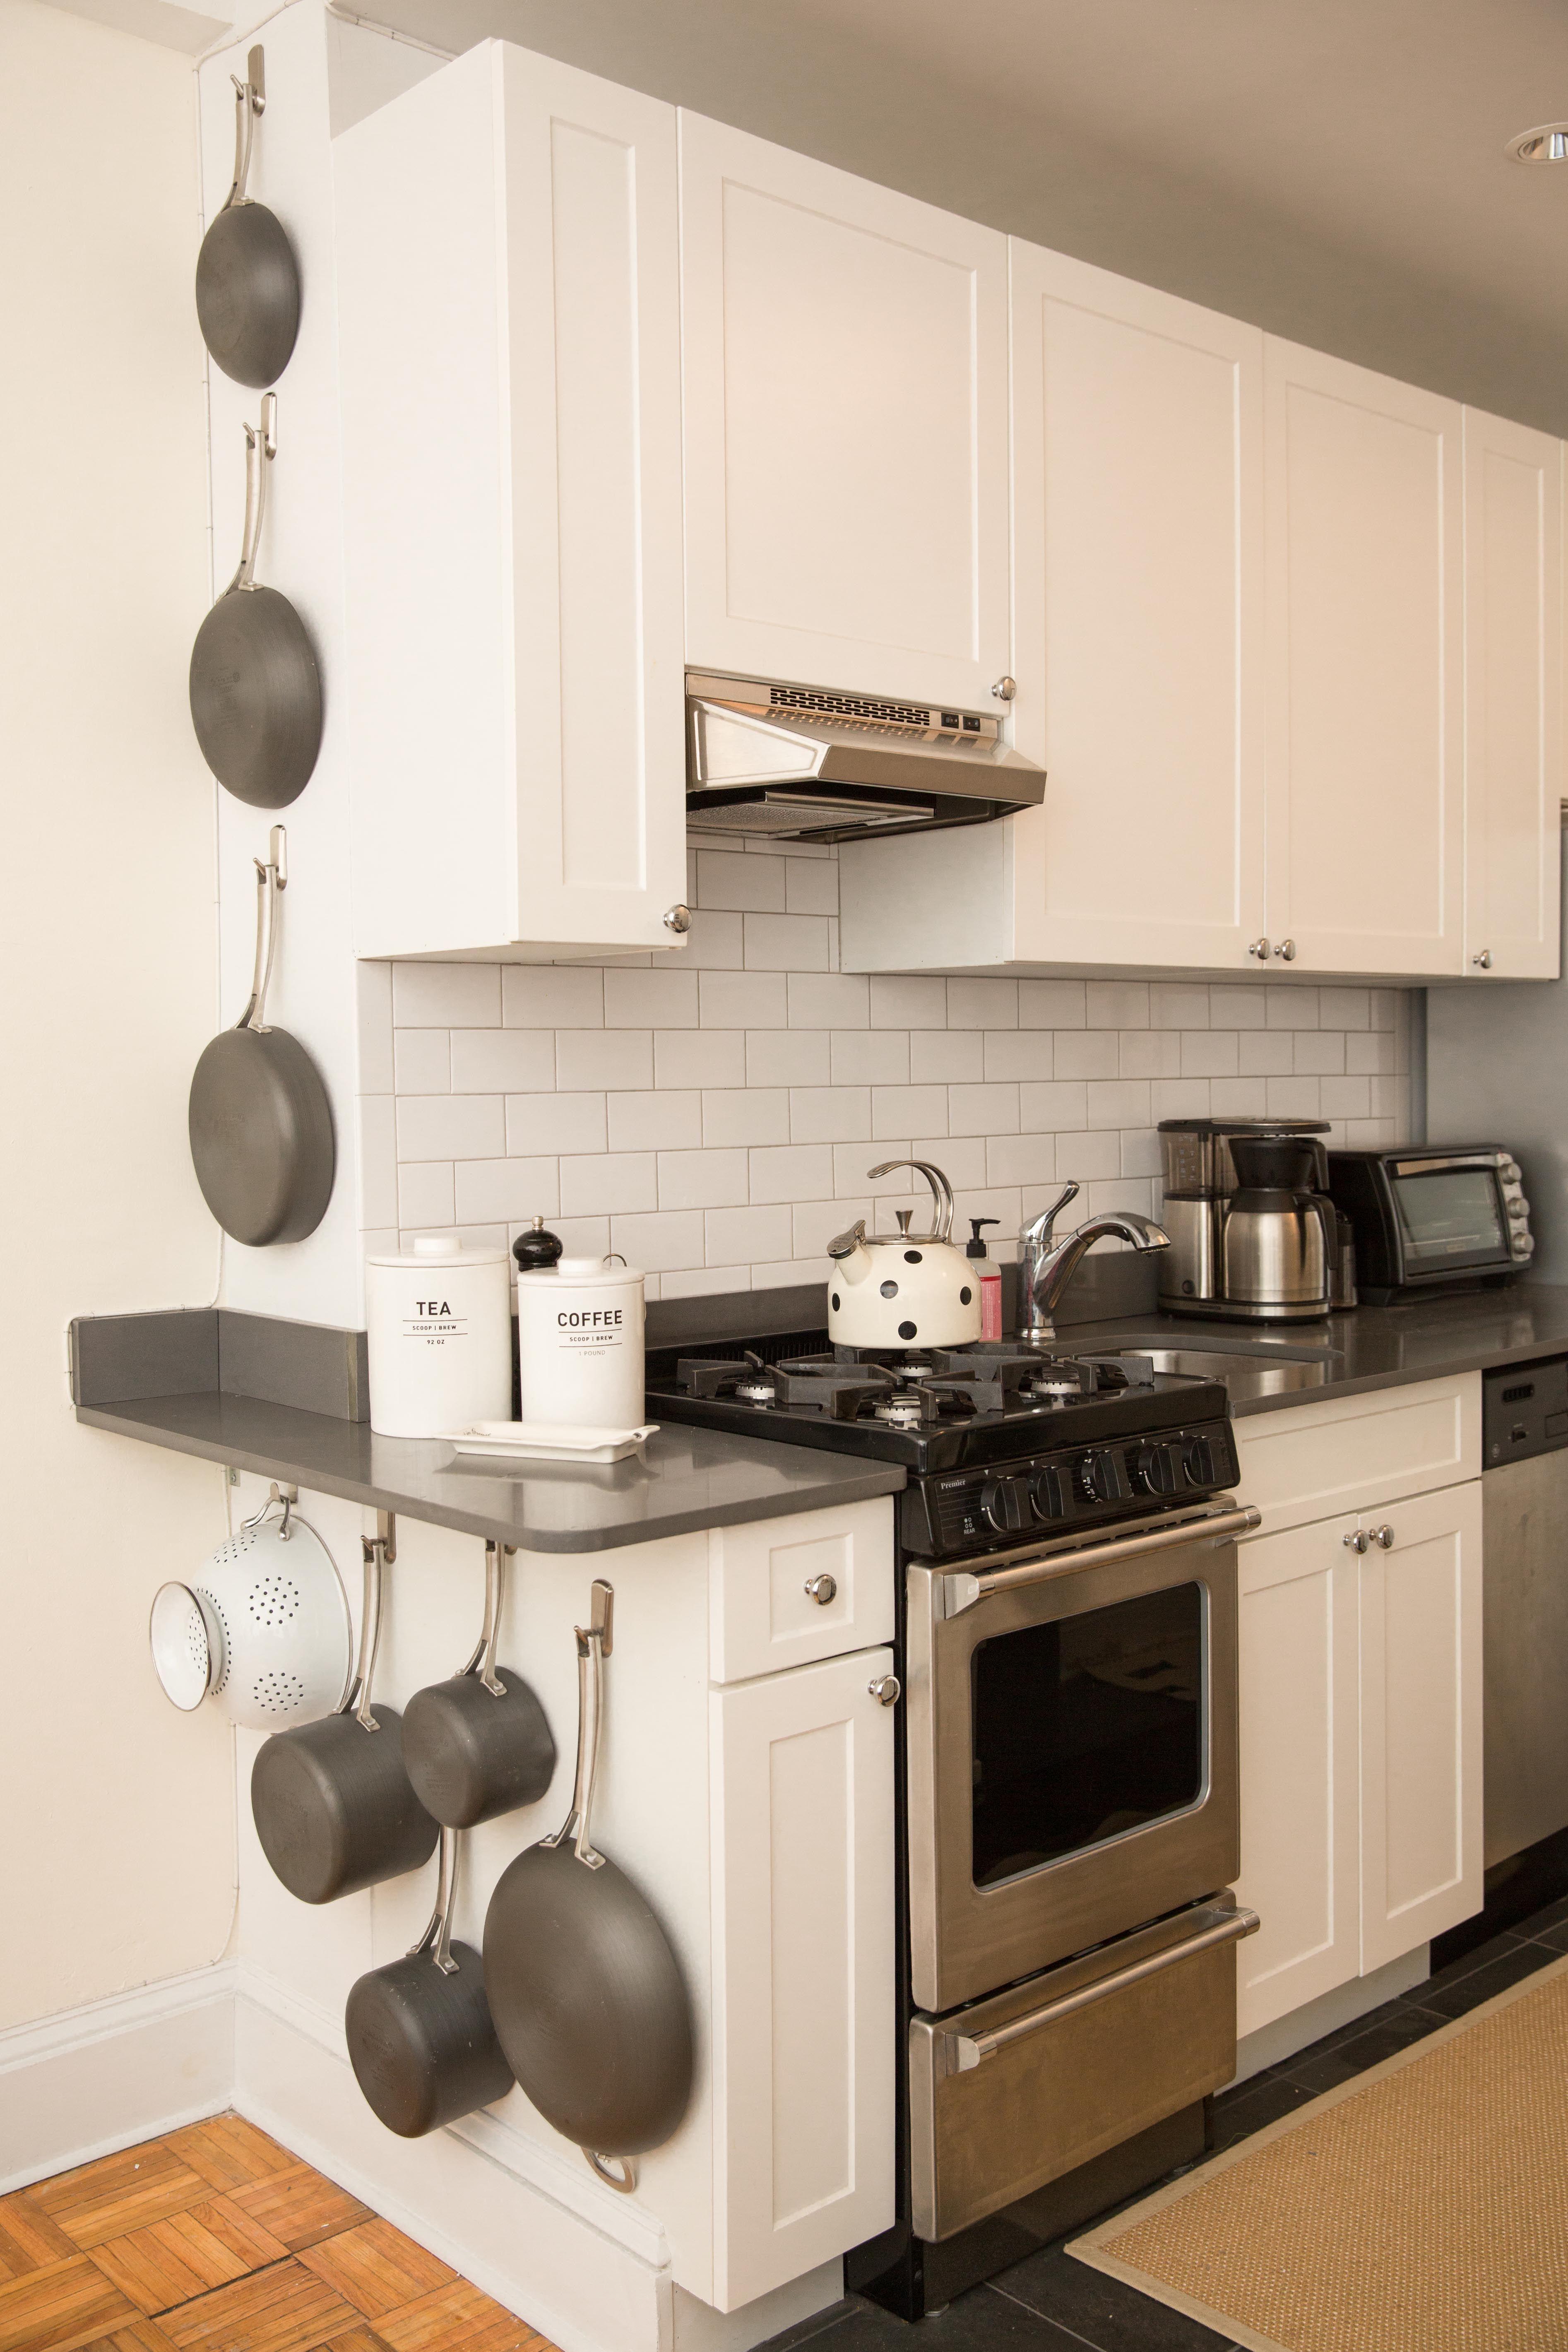 12 small kitchen design ideas tiny kitchen decorating rh goodhousekeeping com